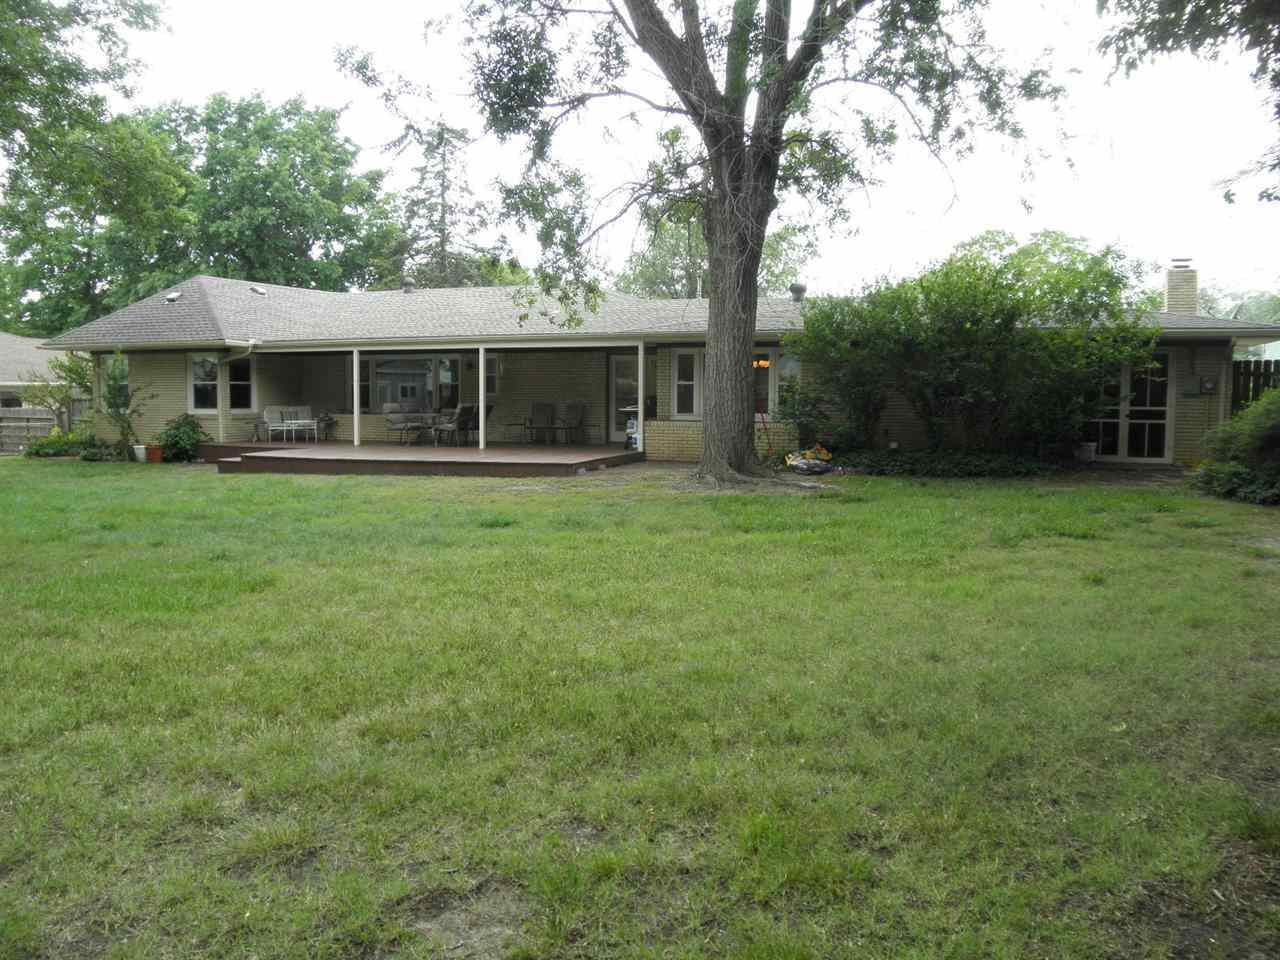 Sold Cross Sale W/ MLS | 127 Fairview  Ponca City, OK 74601 32